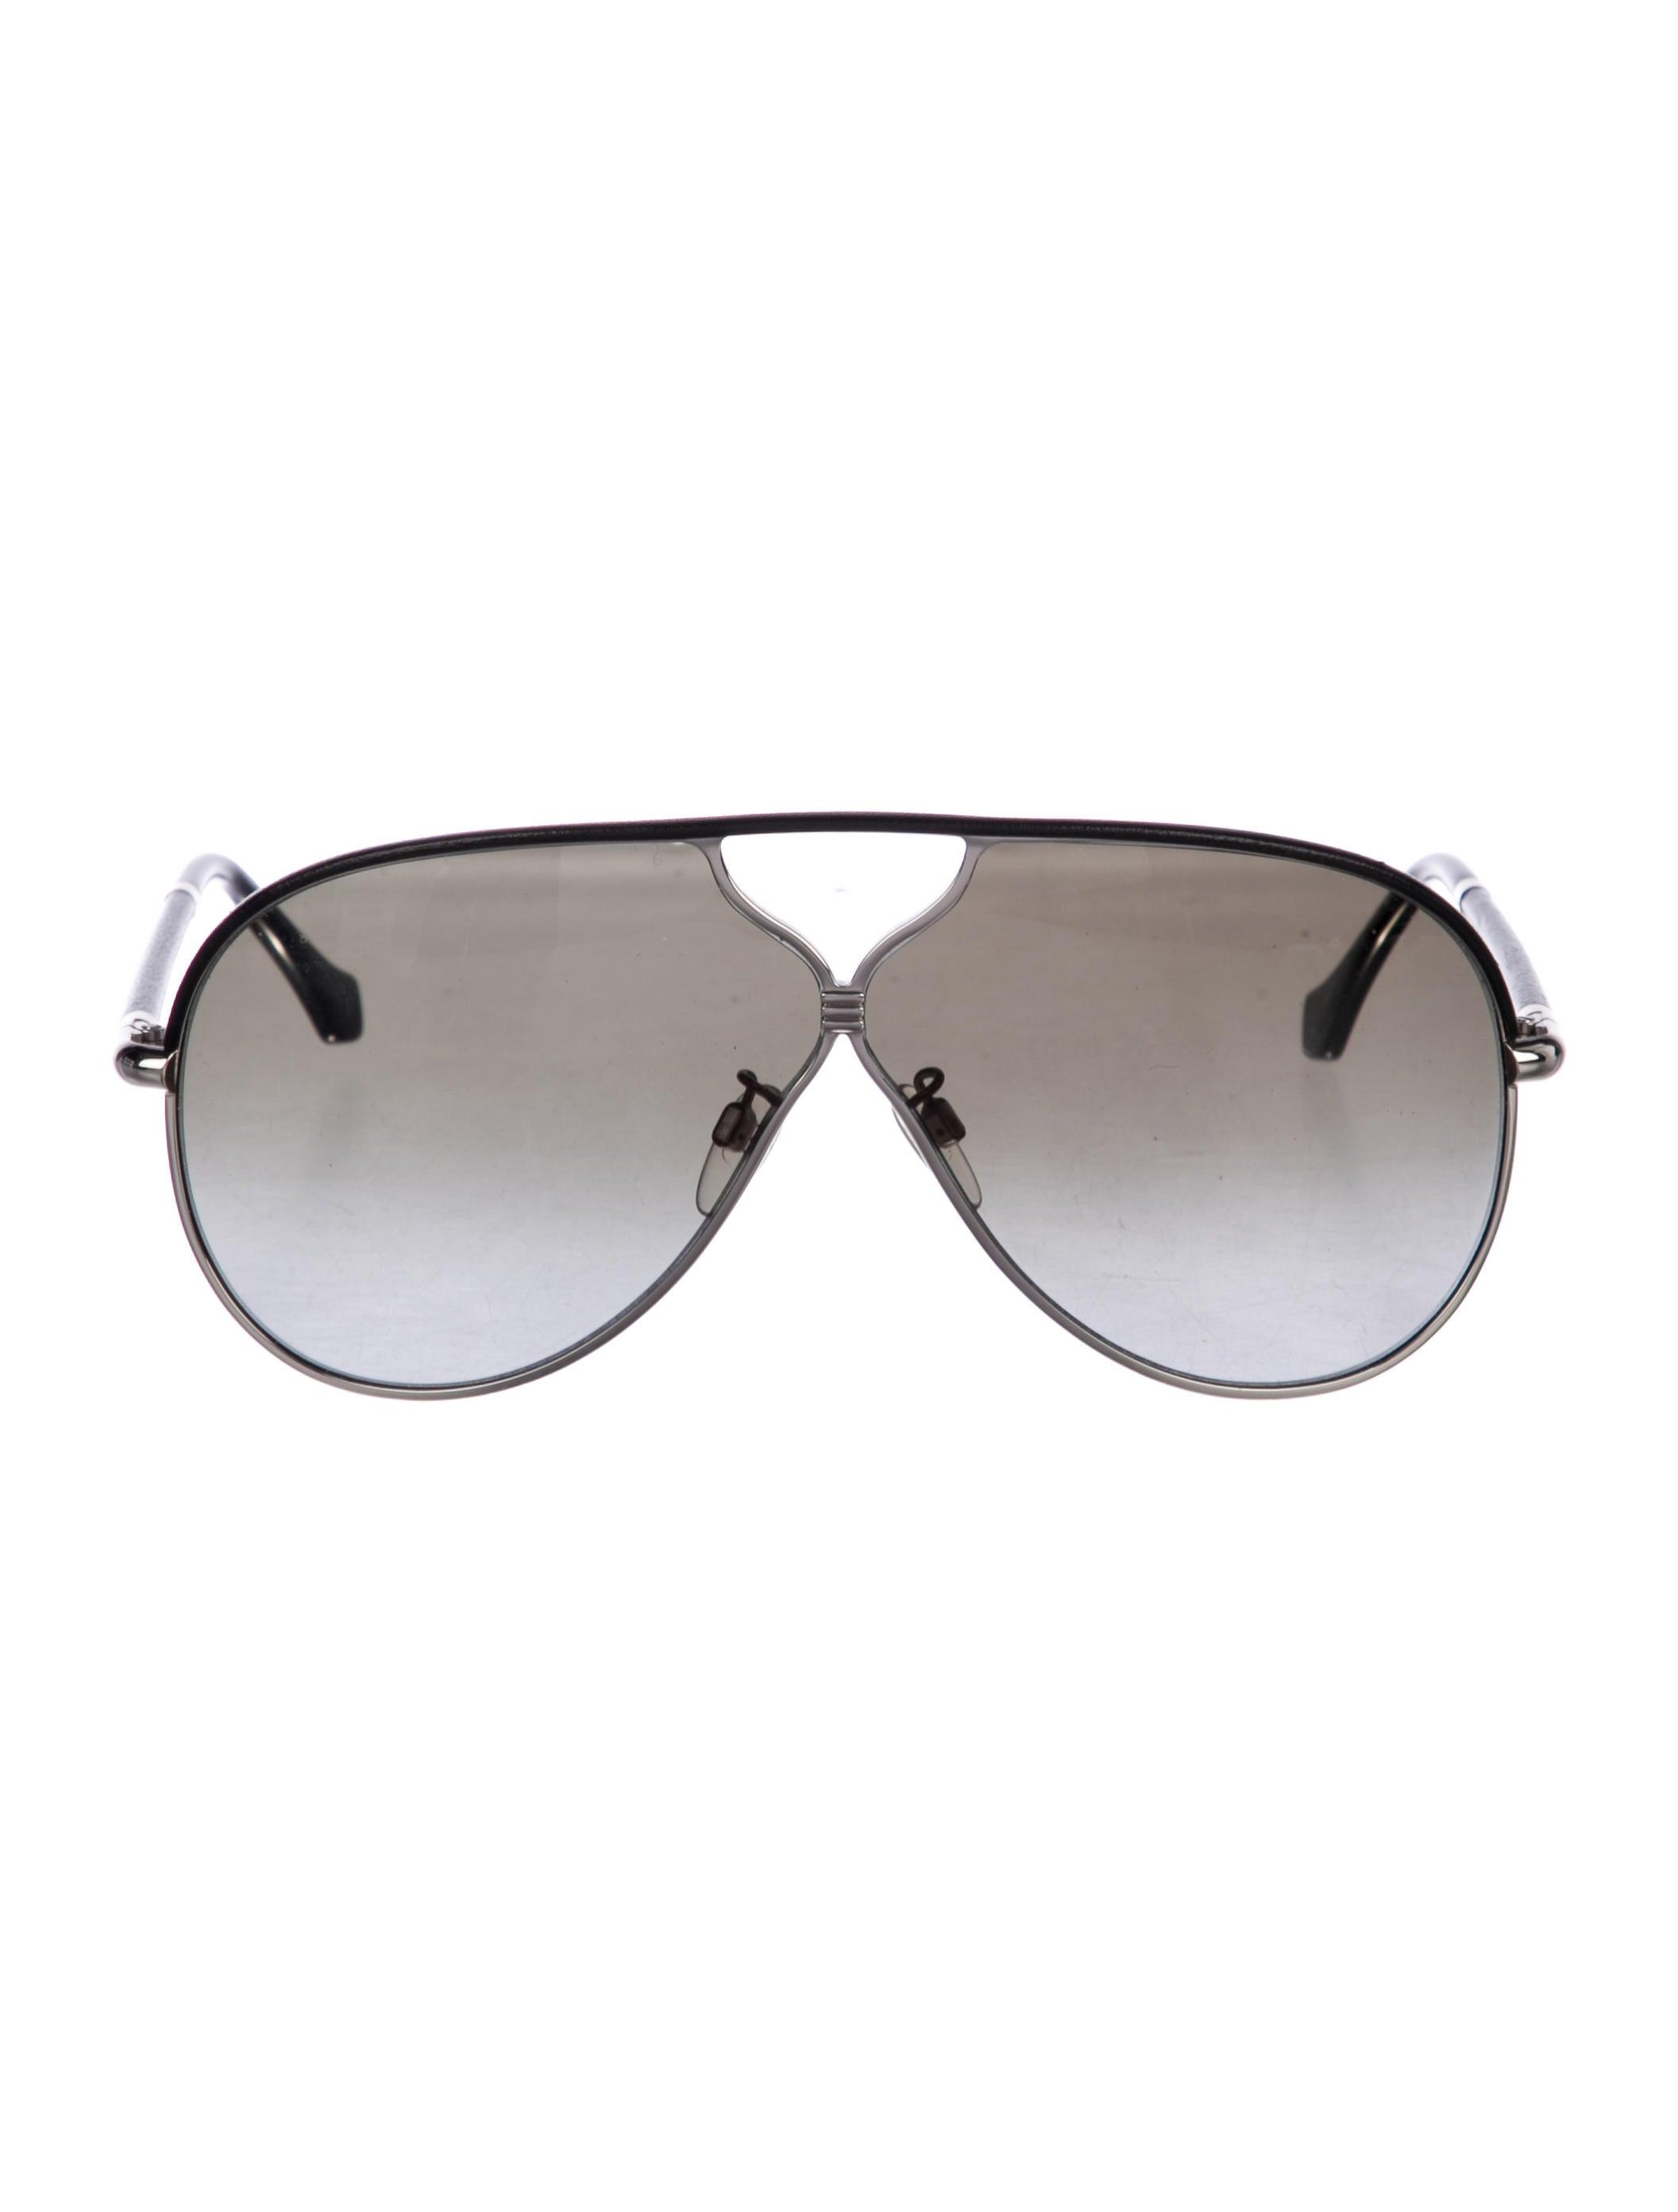 54aac9cda Balenciaga Gradient Aviator Sunglasses - Accessories - BAL75214 ...